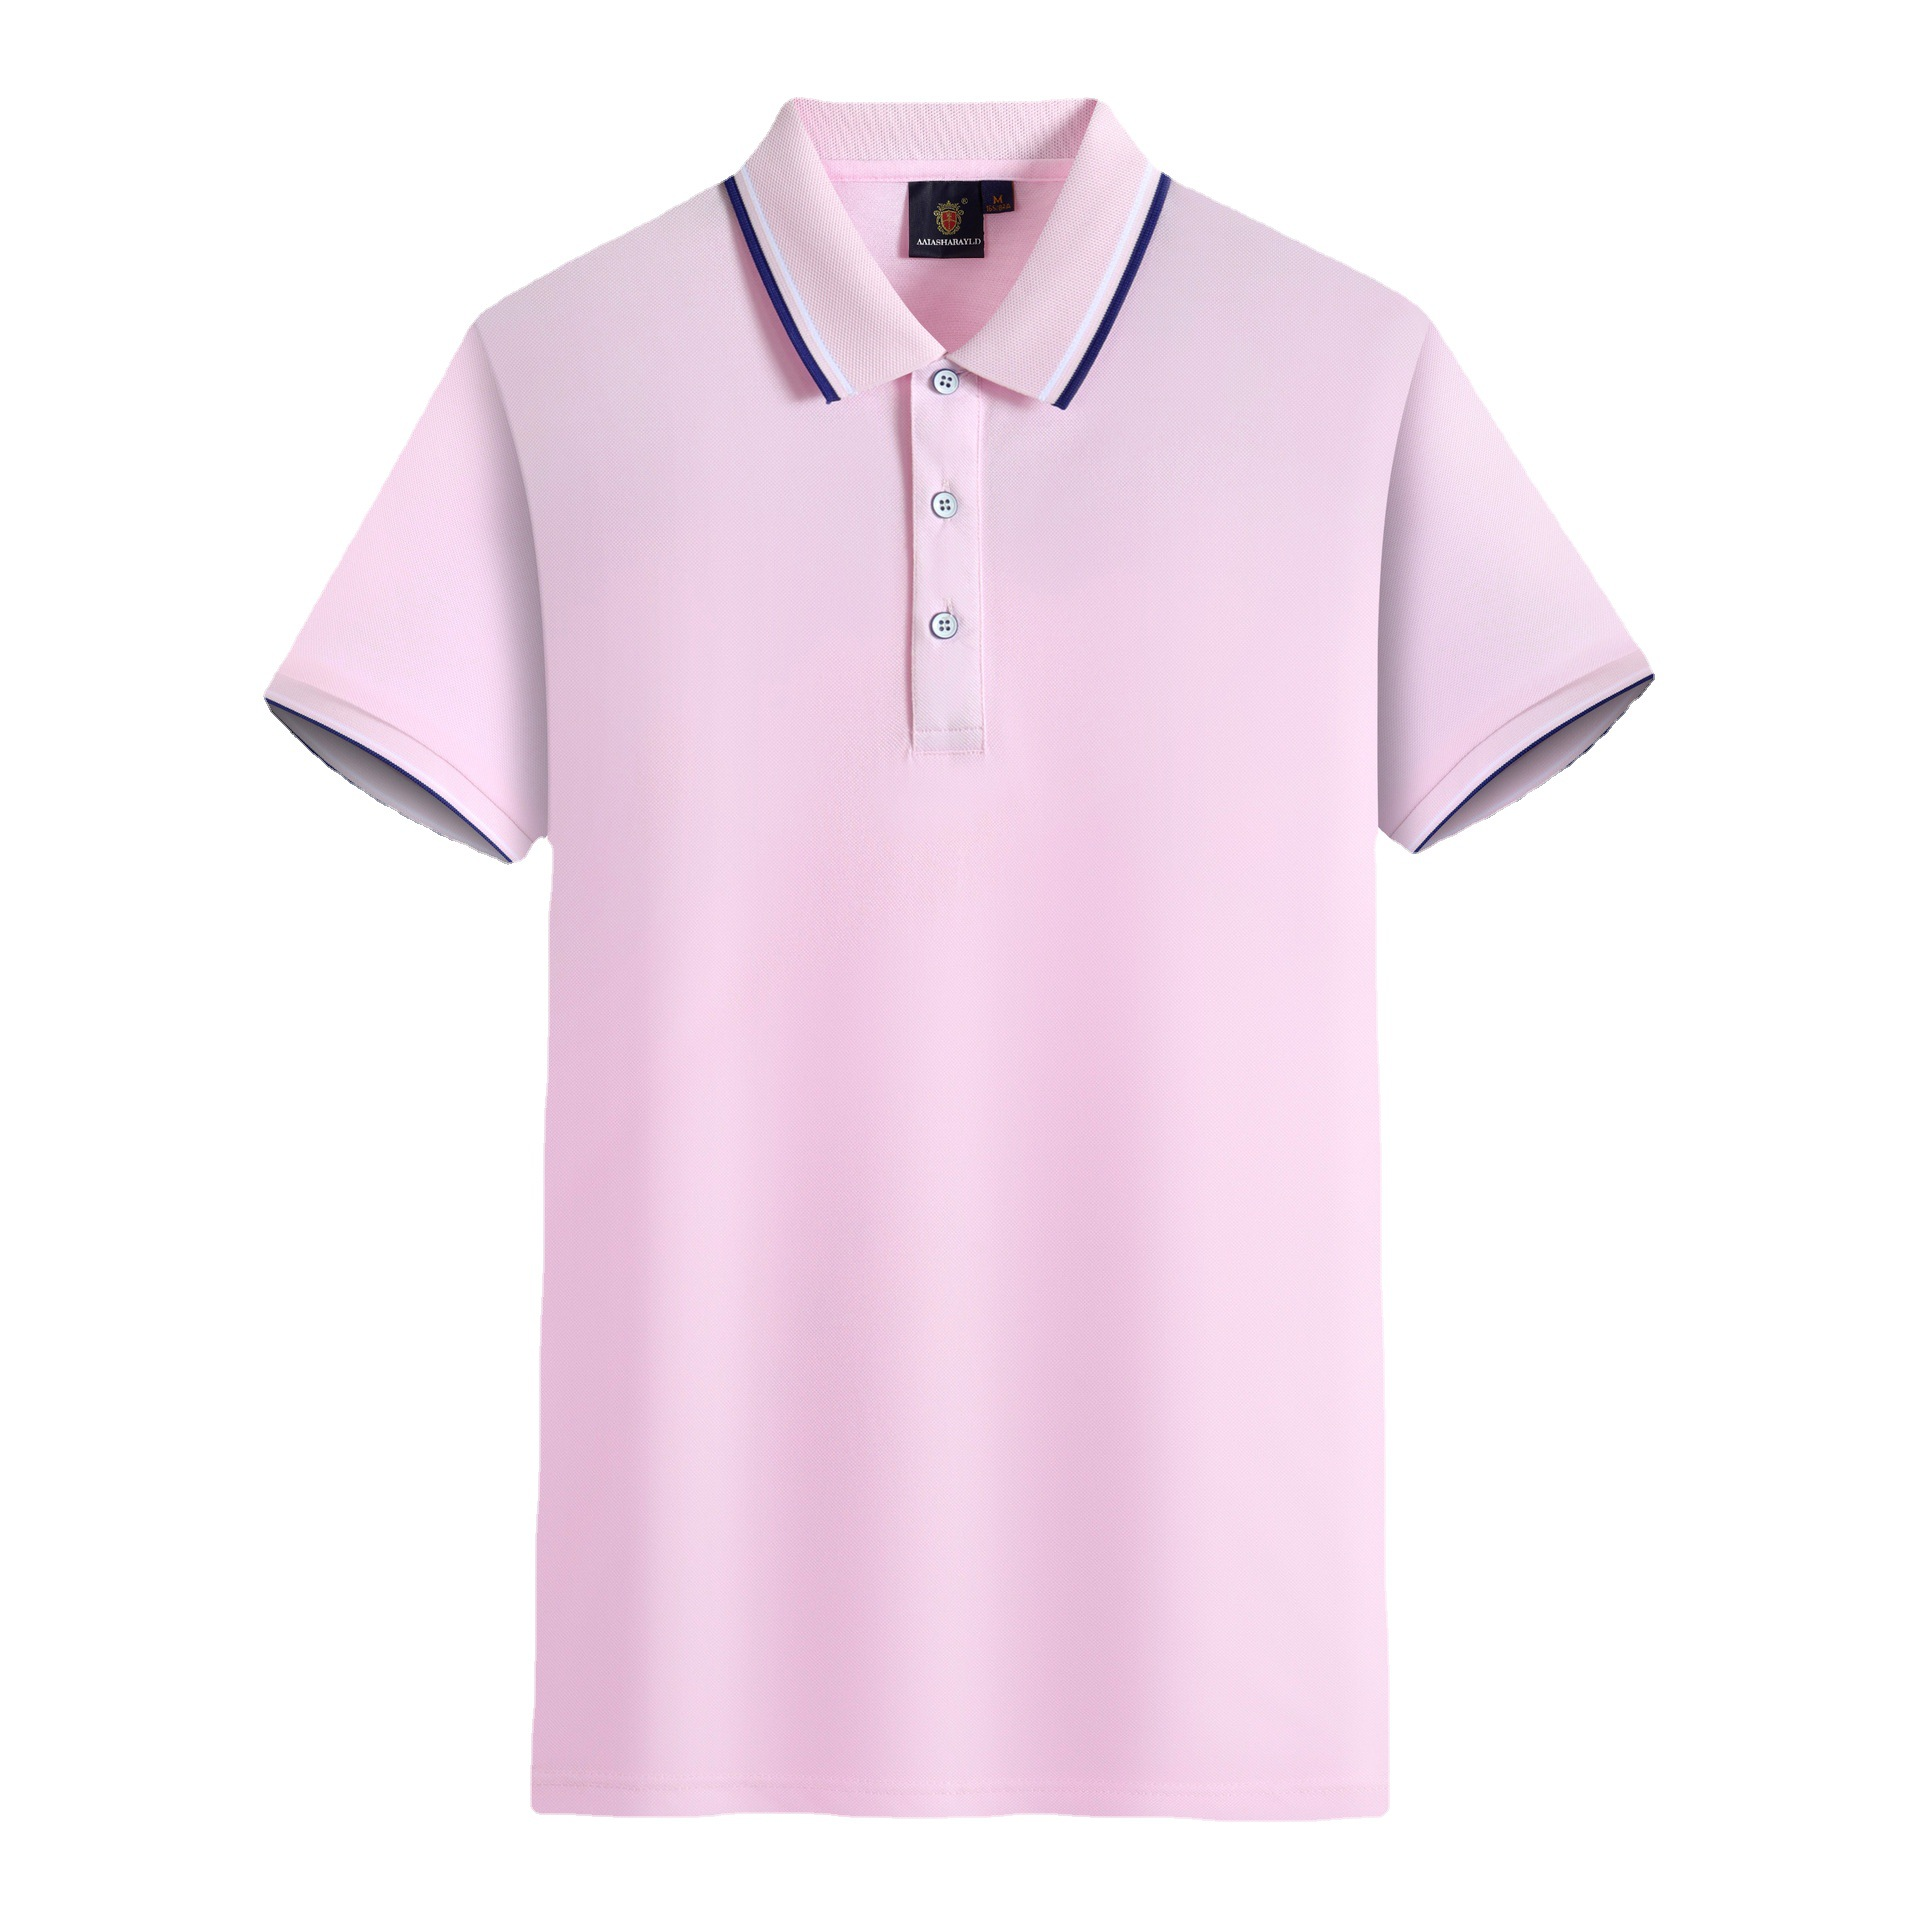 2021 mens new advertising shirt T-shirt Polo Shirt Short Sleeve Polo party custom l Lapel team print